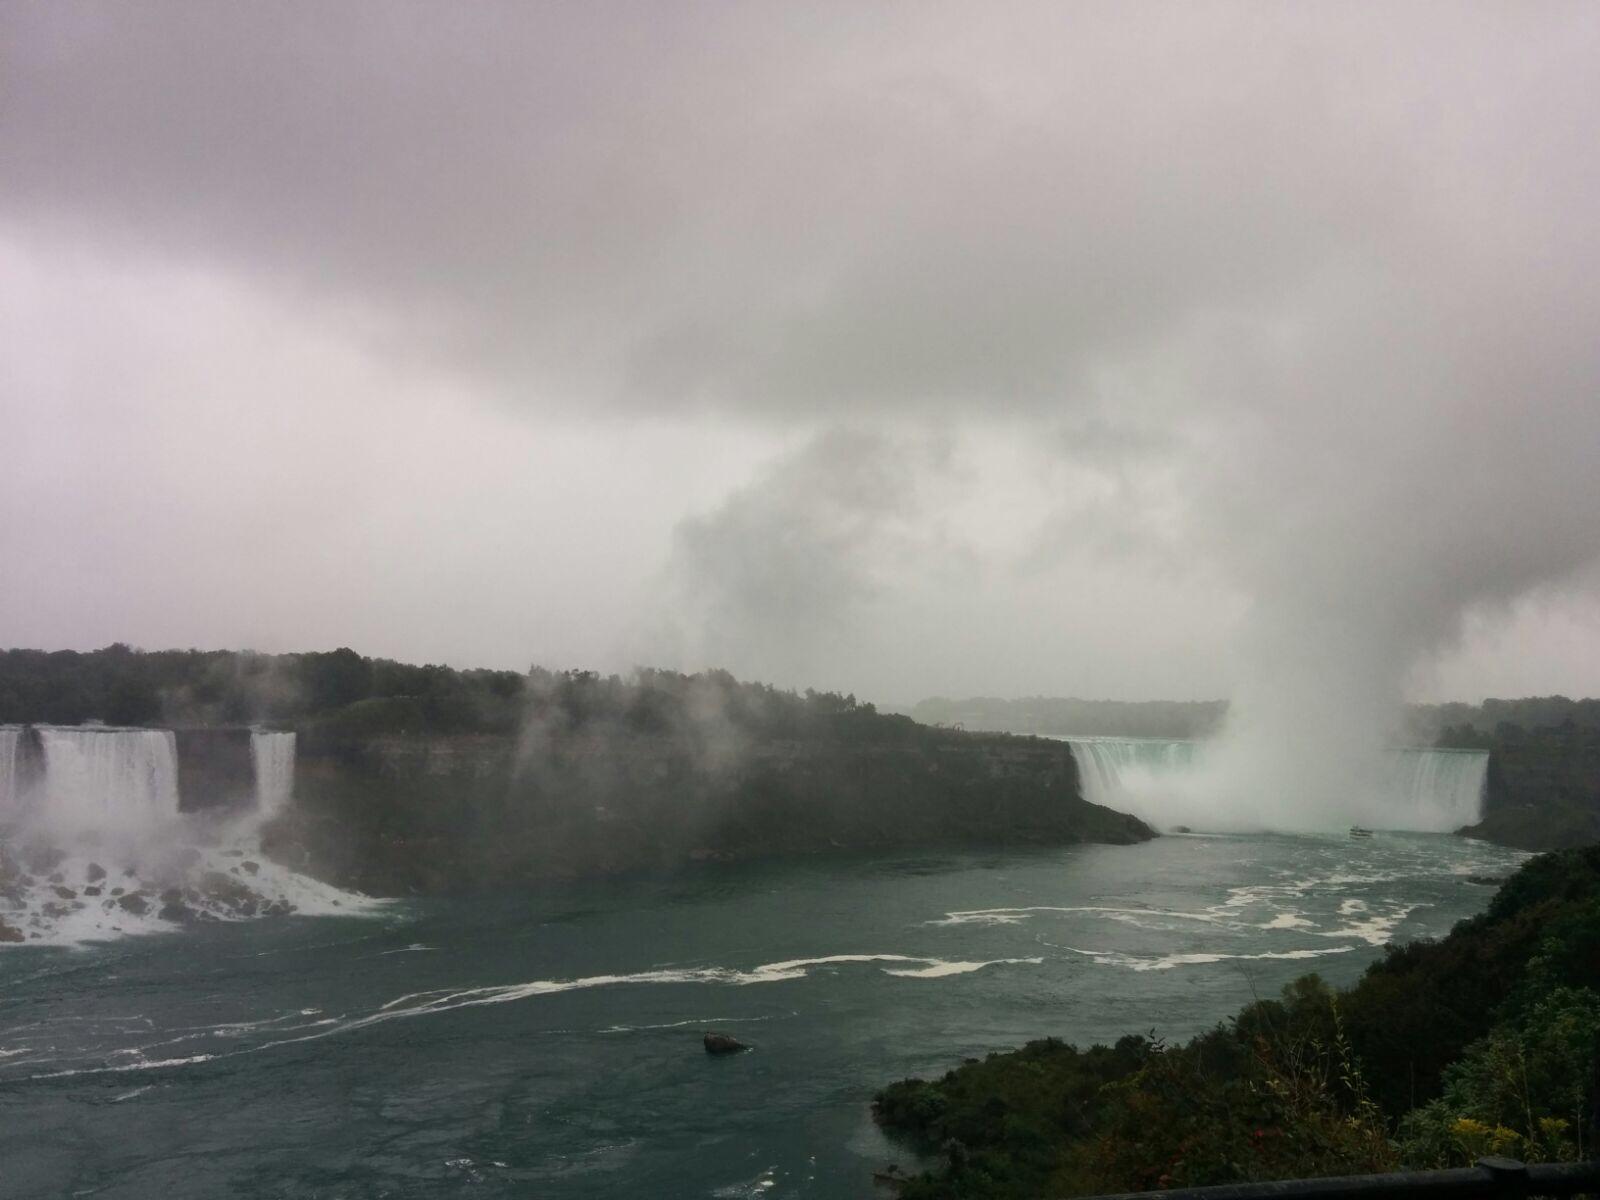 Niagara Falls - view from the shore